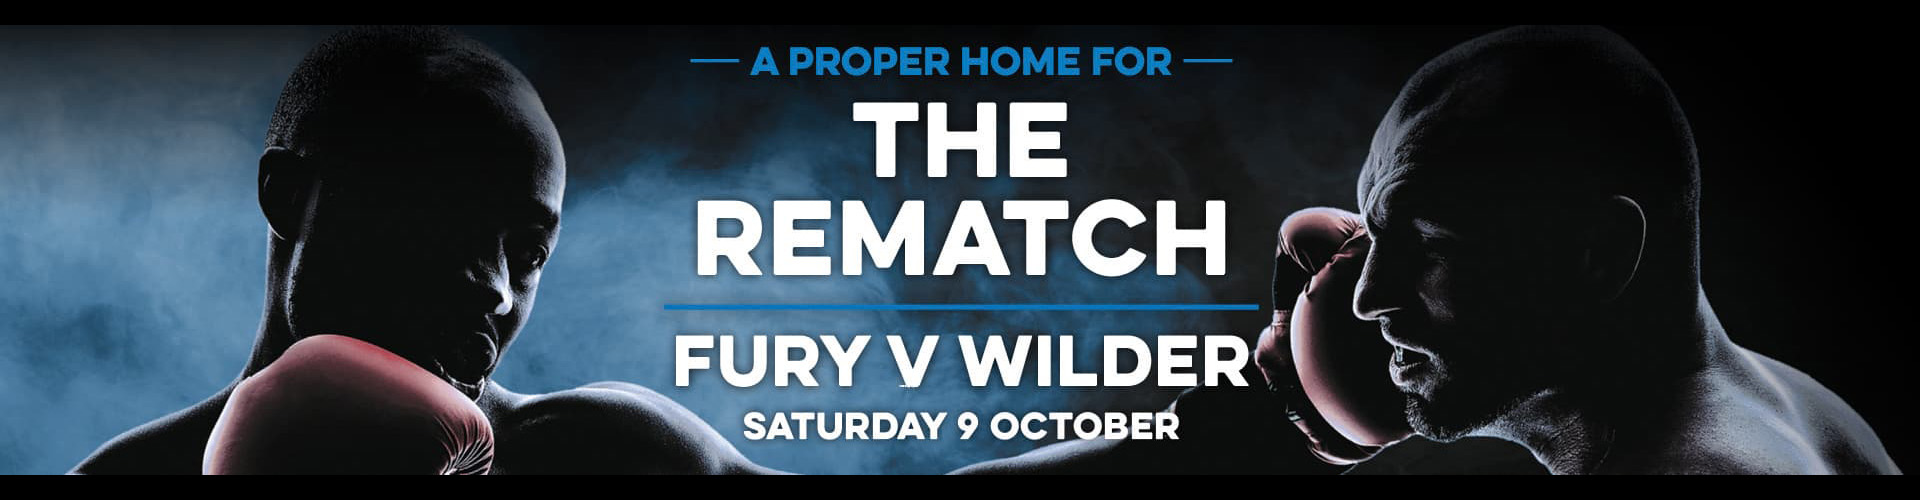 Fury vs Wilder Promo Image - Great UK Pubs